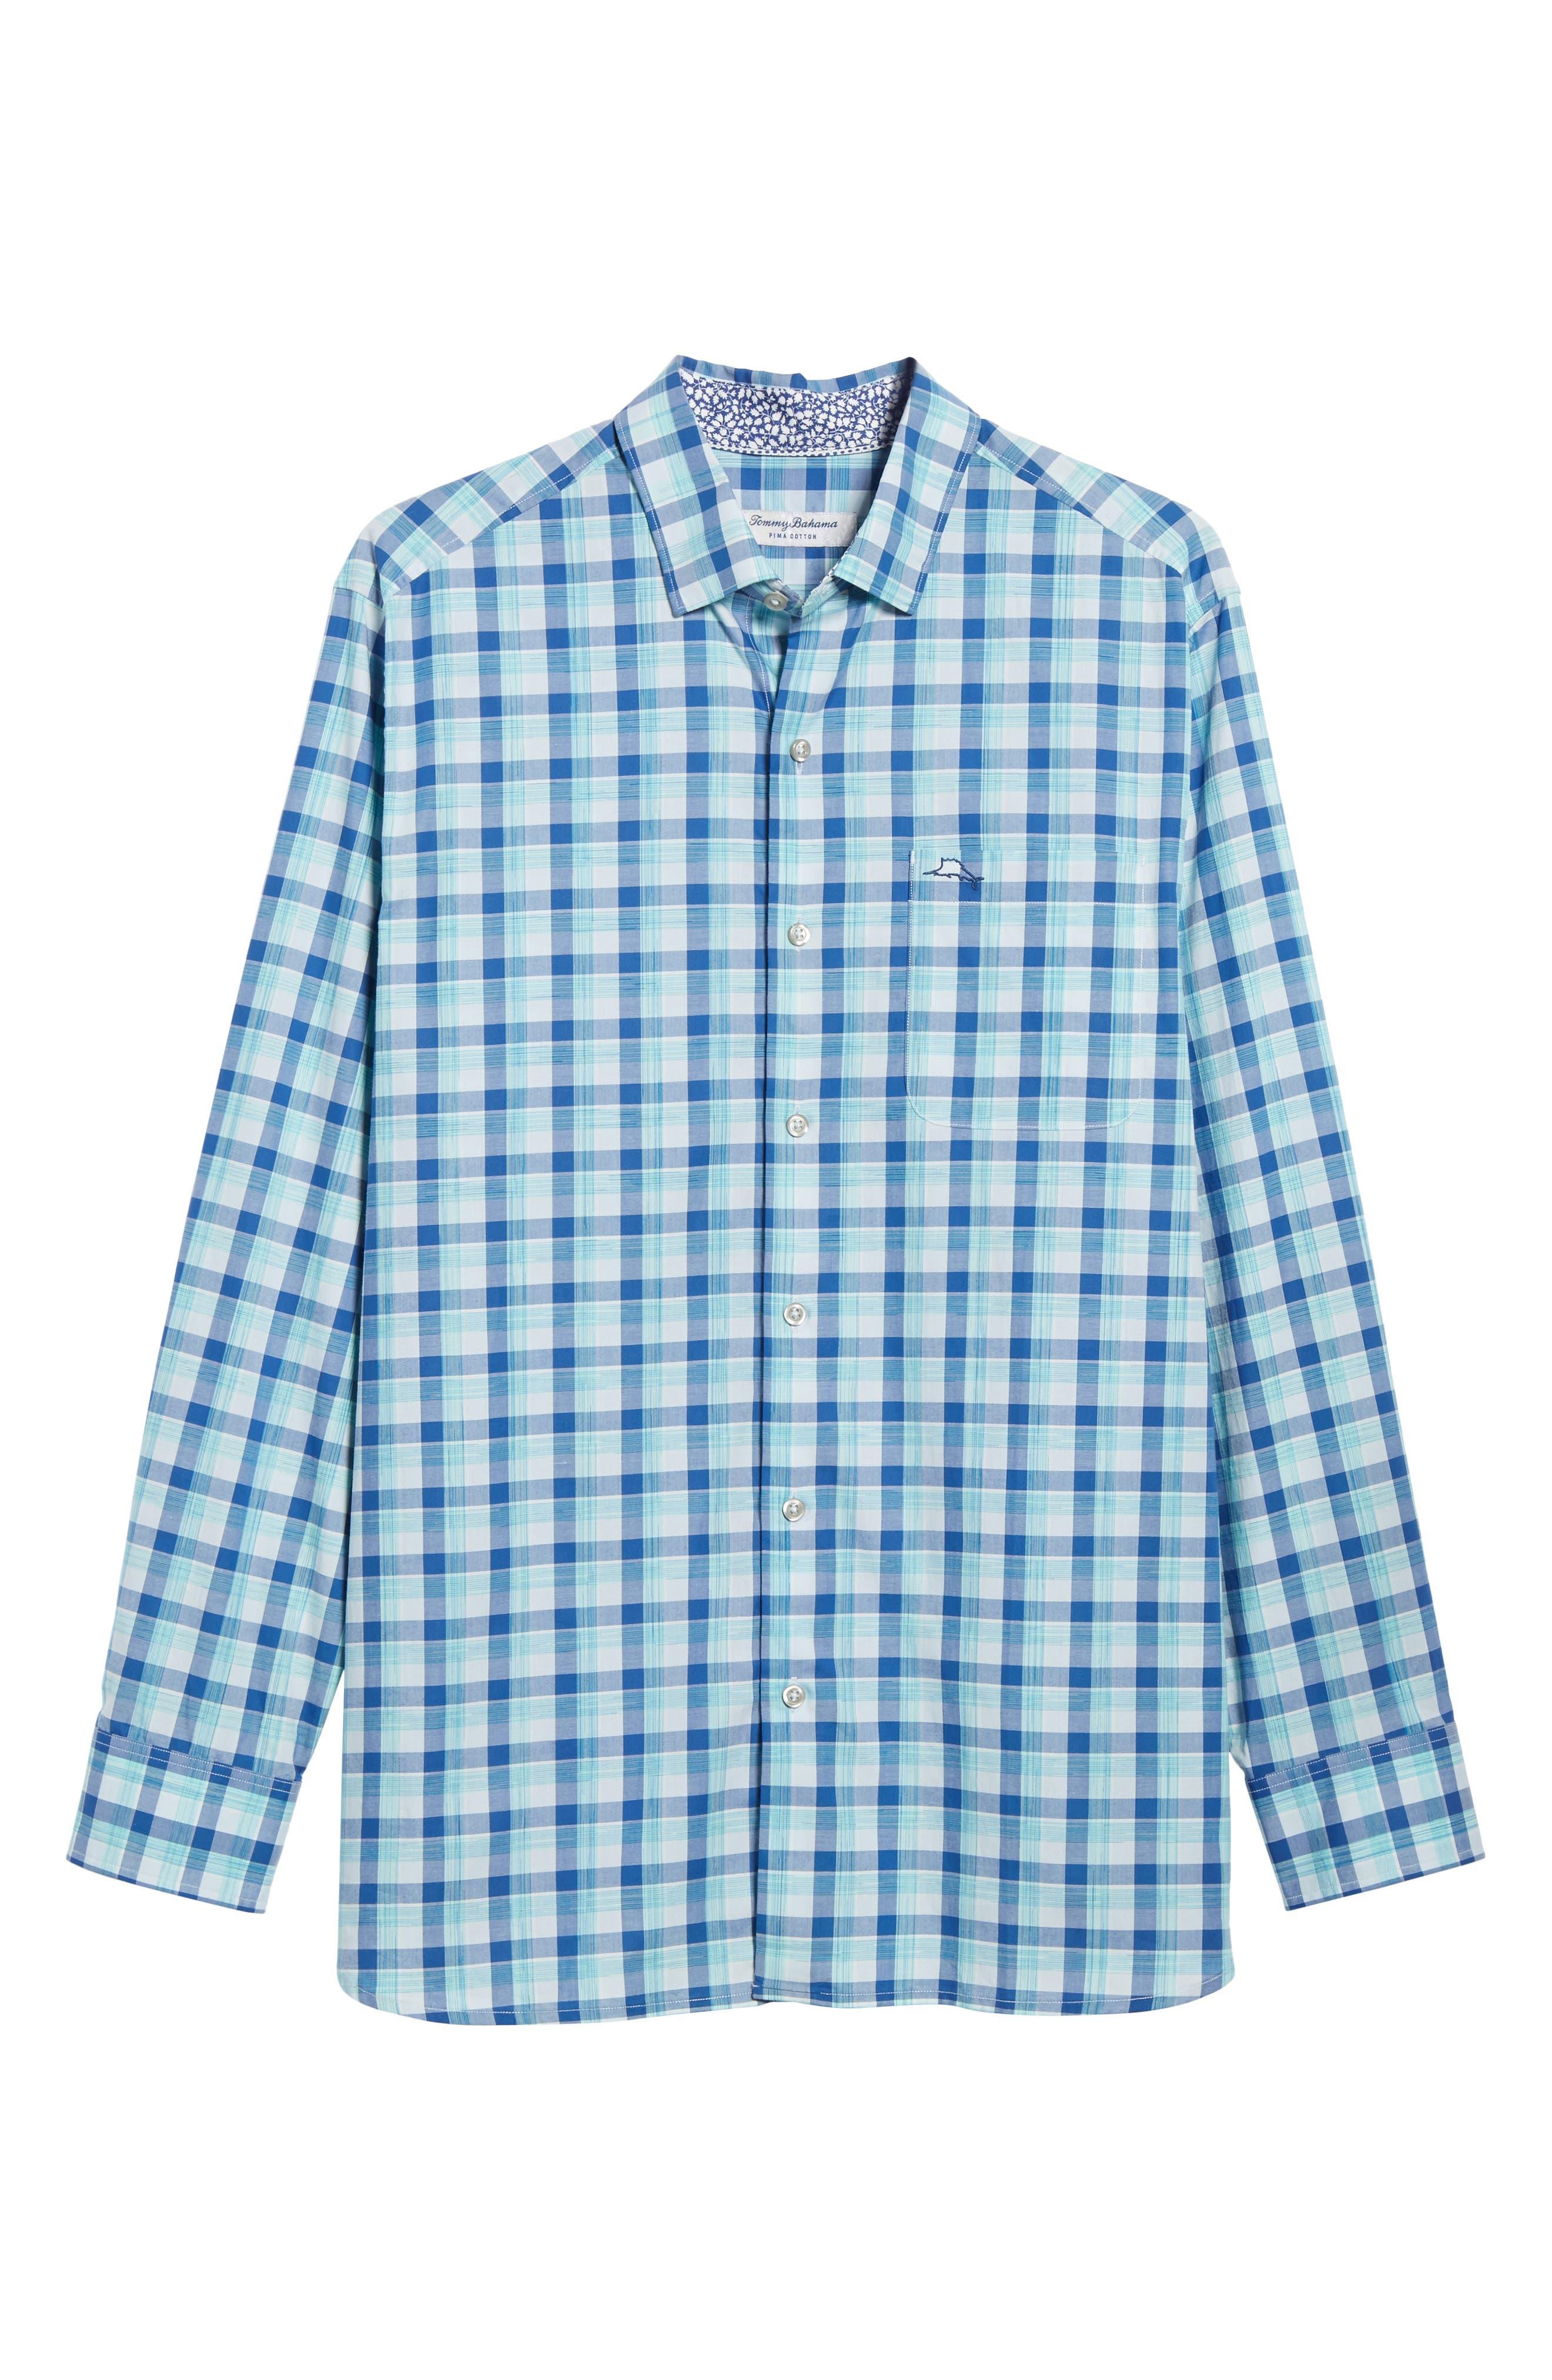 Atlantic Tides Classic Fit Plaid Sport Shirt,                             Alternate thumbnail 6, color,                             Galaxy Blue